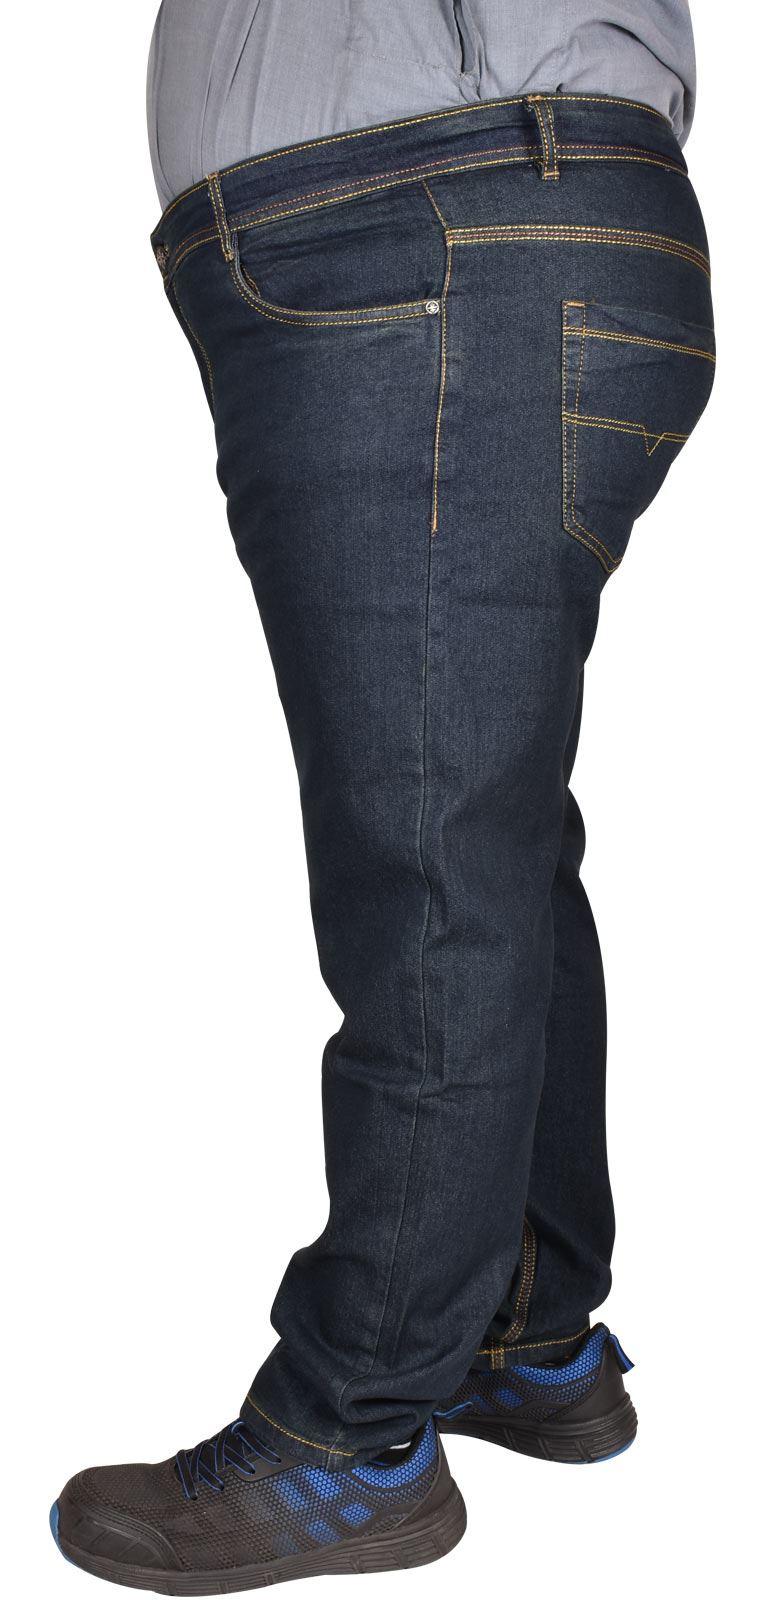 Men-Jeans-Straight-Leg-Stretch-Denim-Trouser-Pants-All-Waist-Big-Tall-King-Sizes thumbnail 6